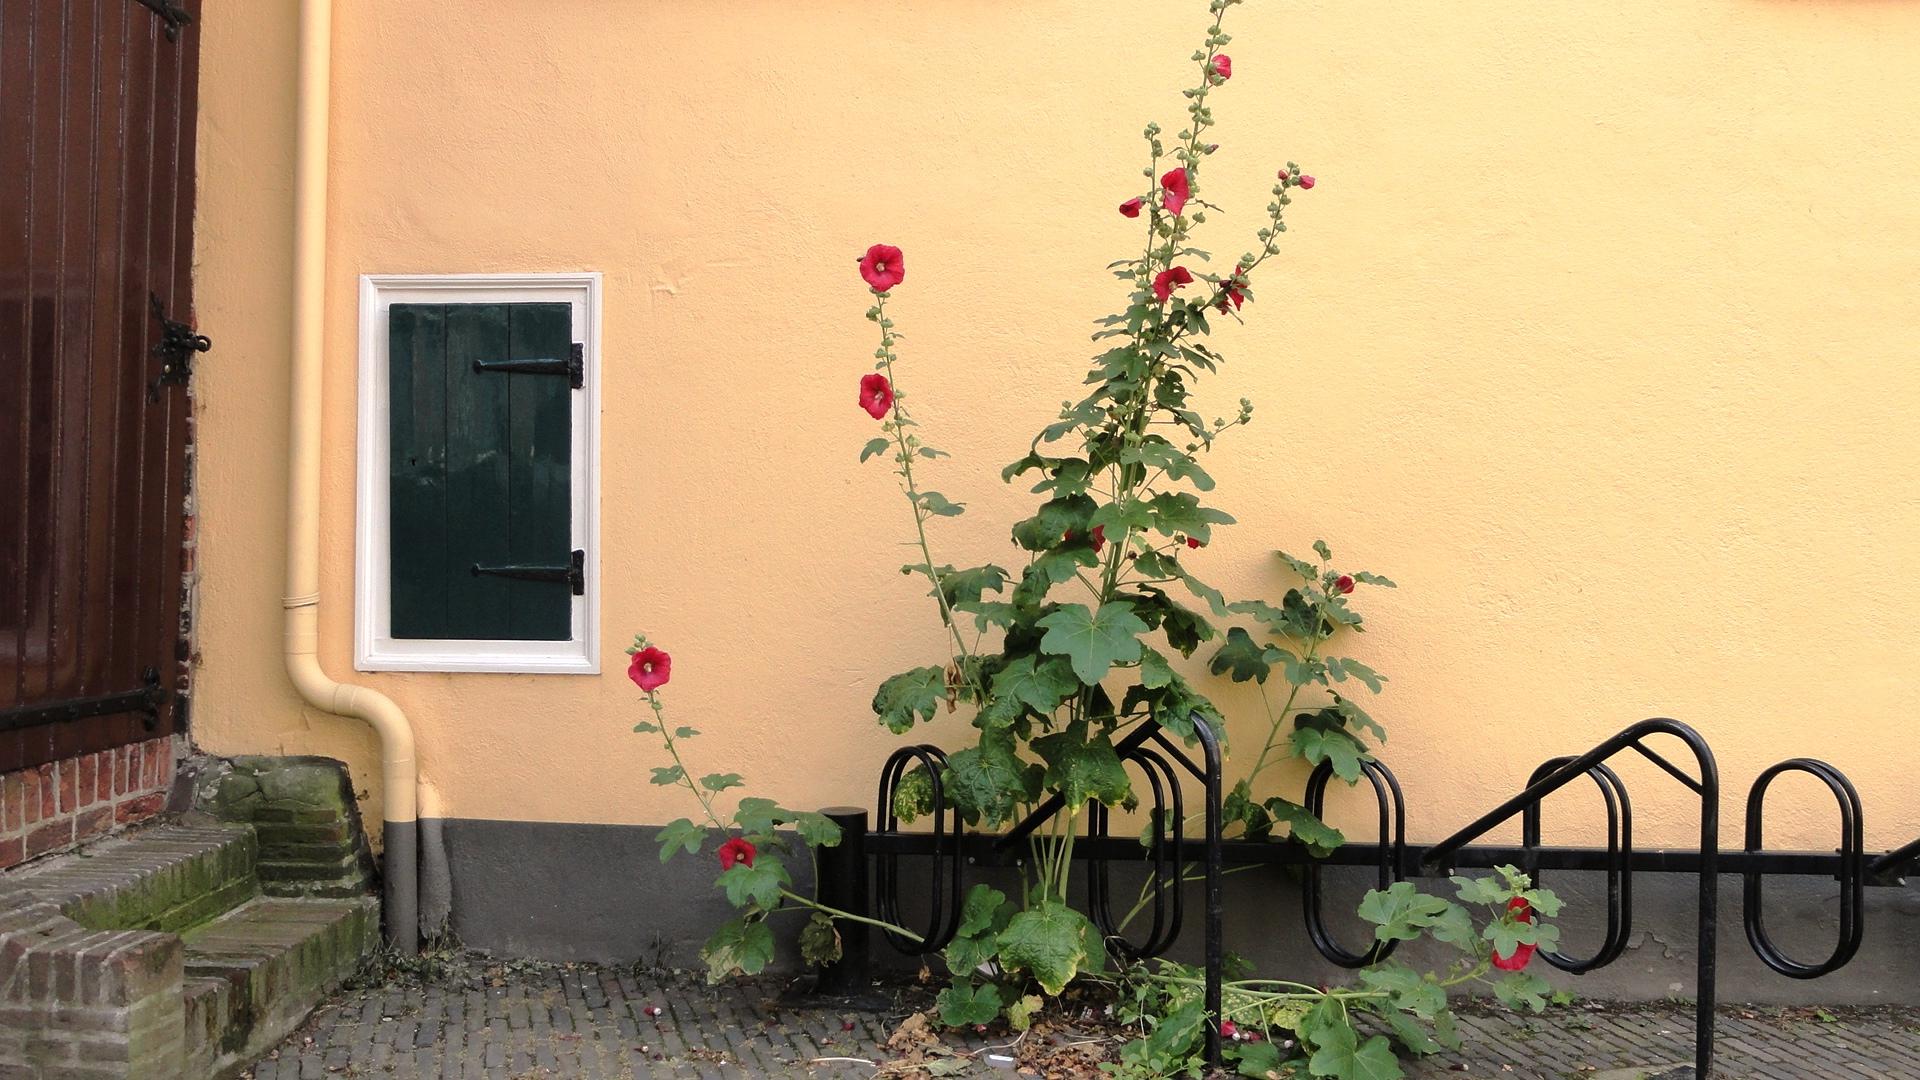 Utrecht - Roses trémières